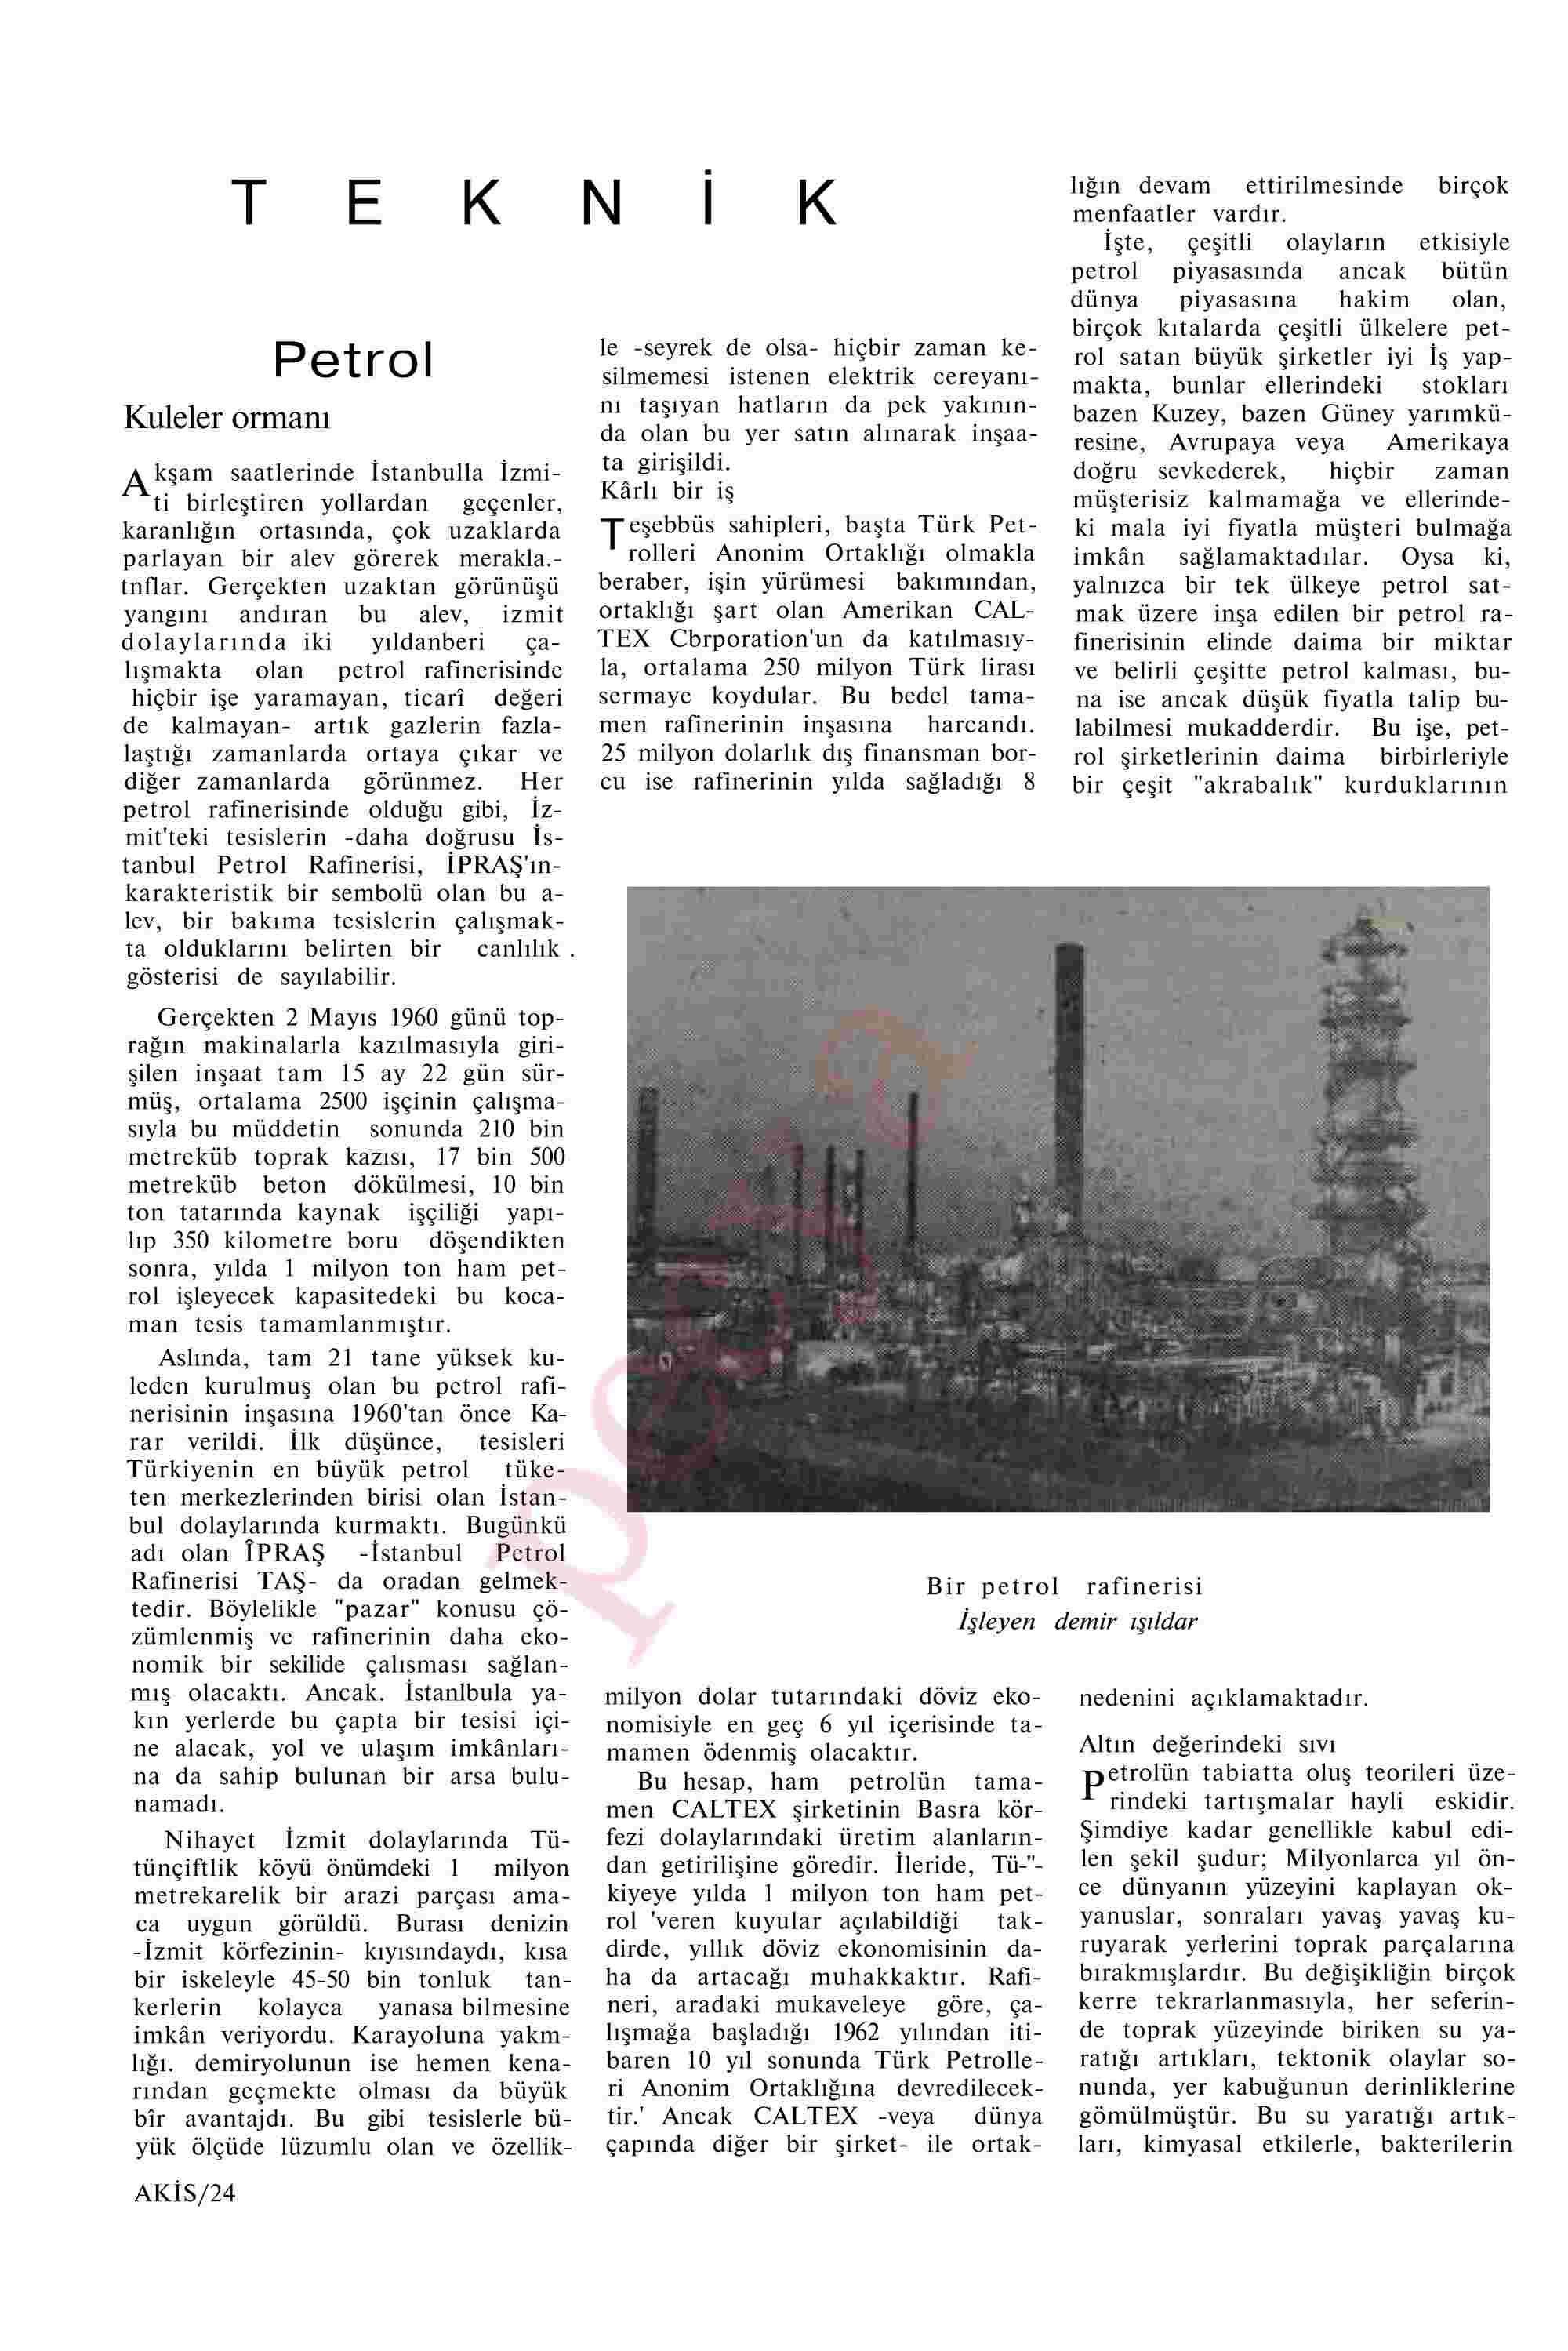 20 Temmuz 1963 Tarihli Akis Dergisi Sayfa 24